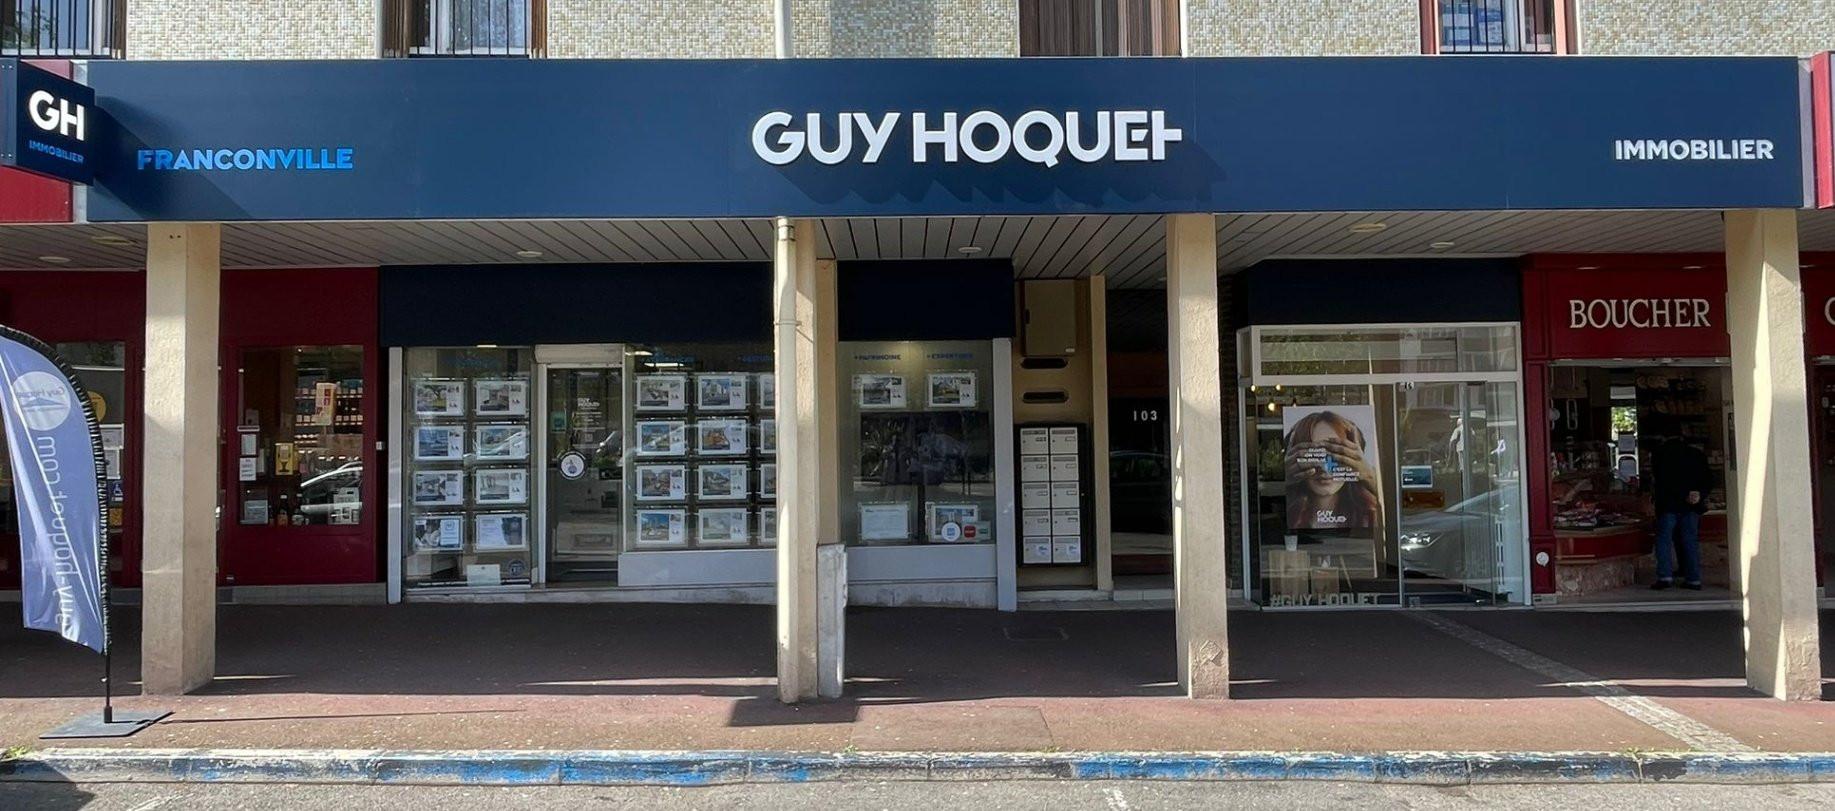 Agence Guy Hoquet FRANCONVILLE